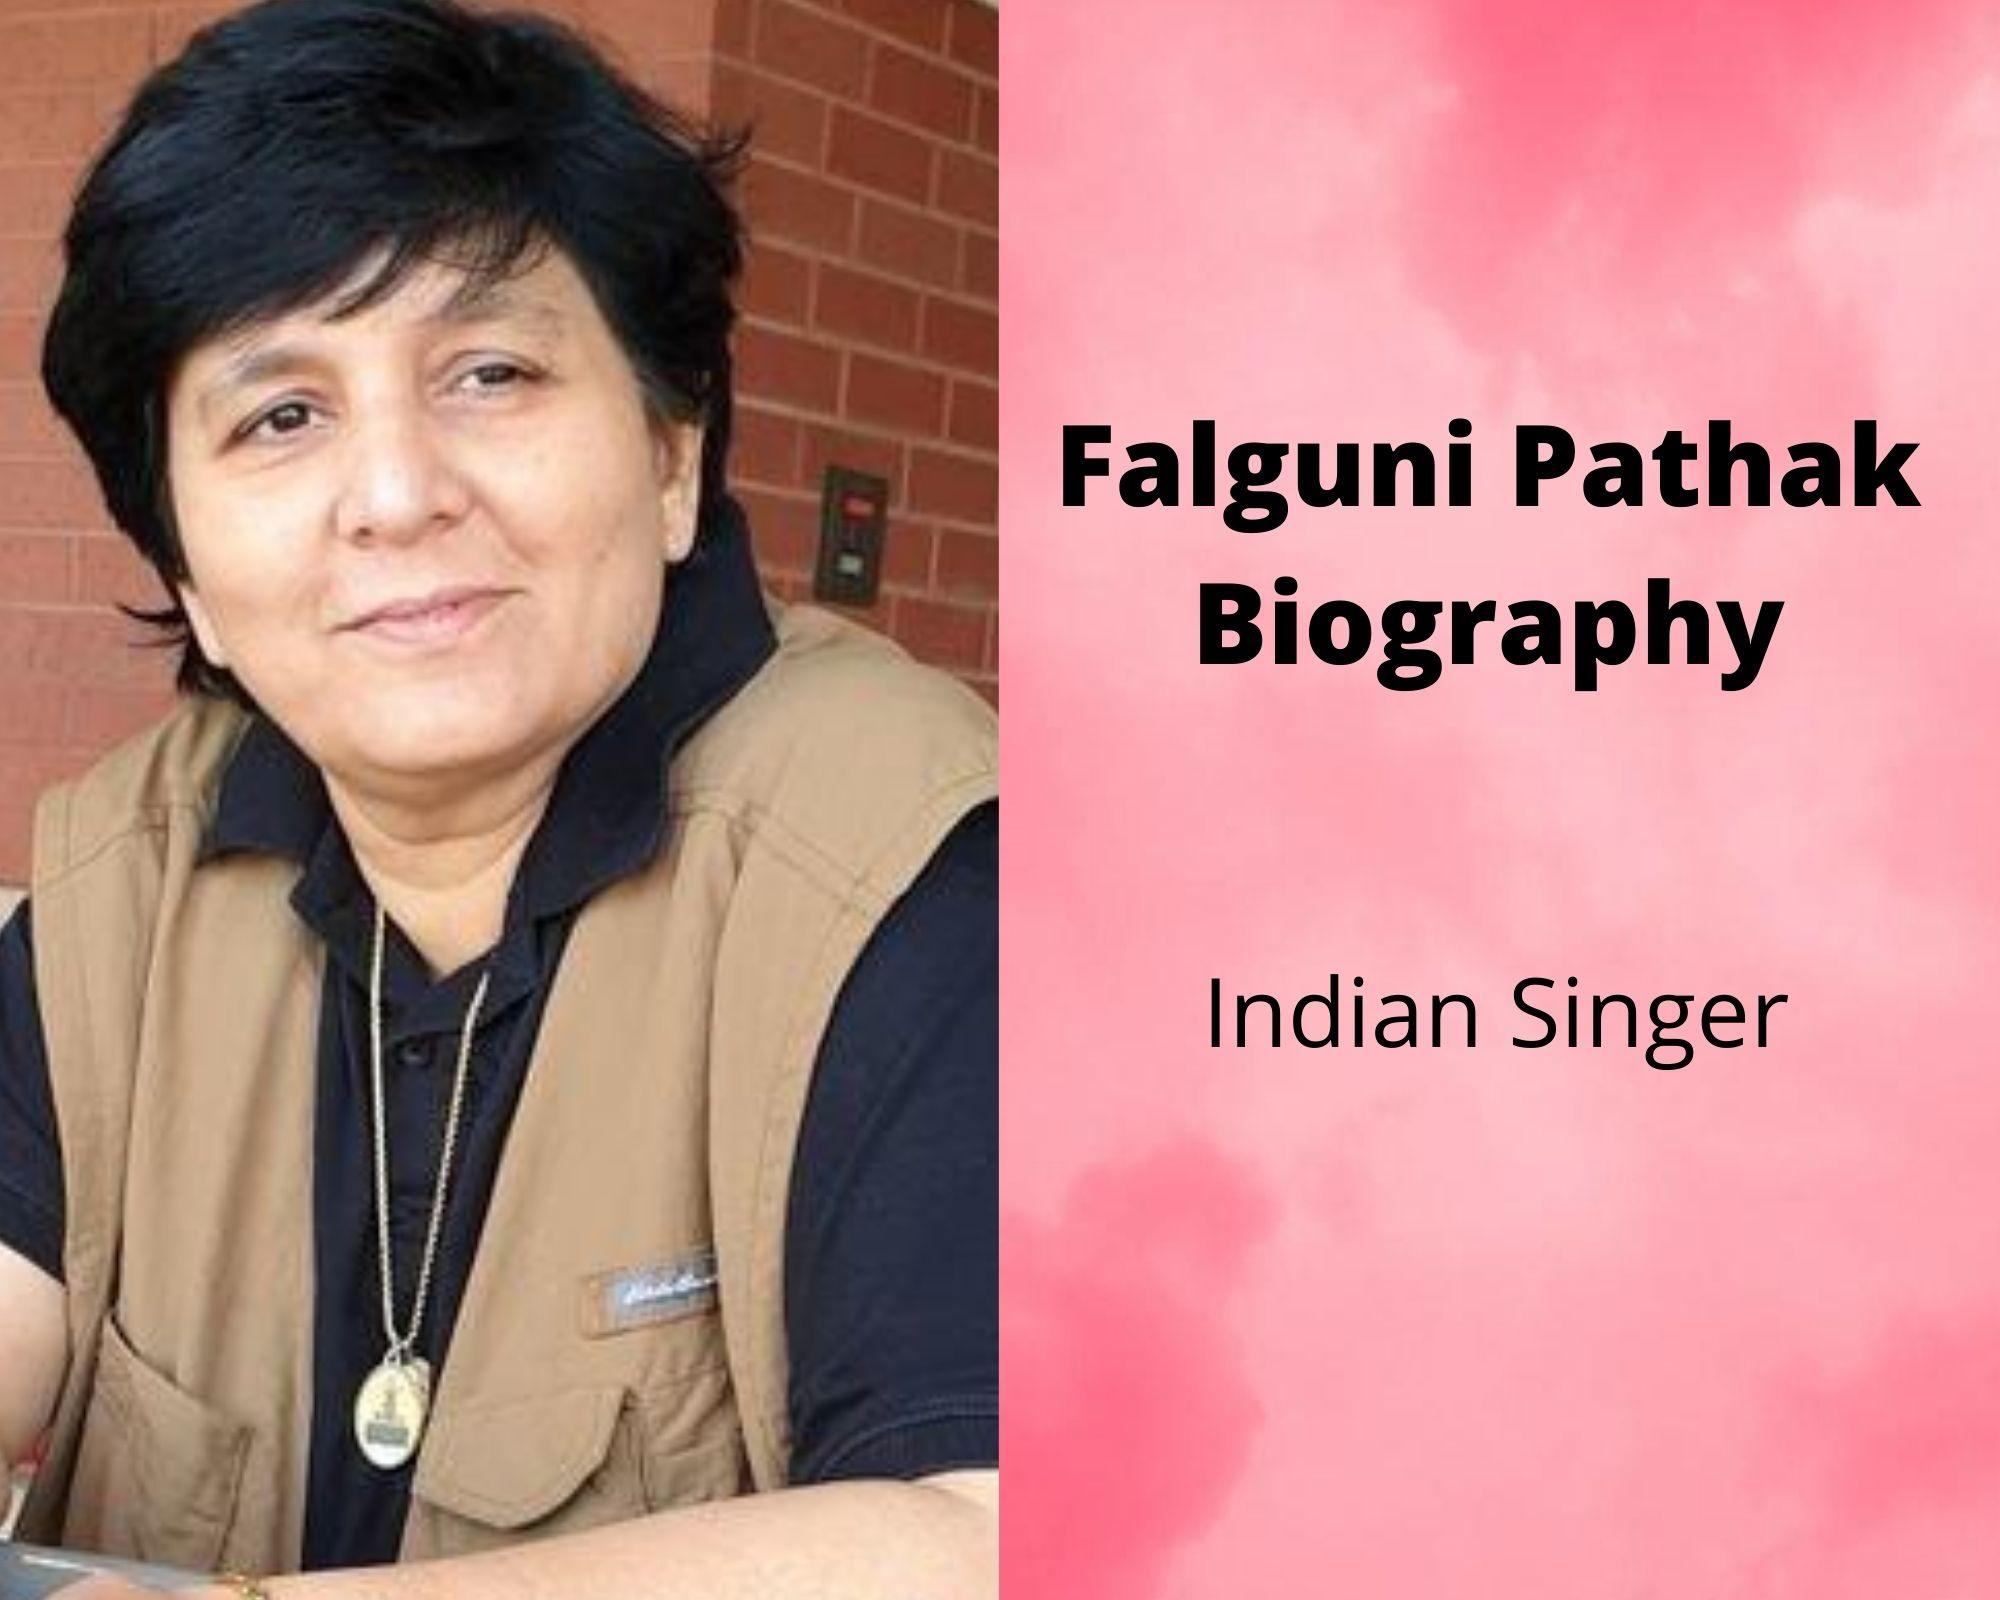 Falguni Pathak biography